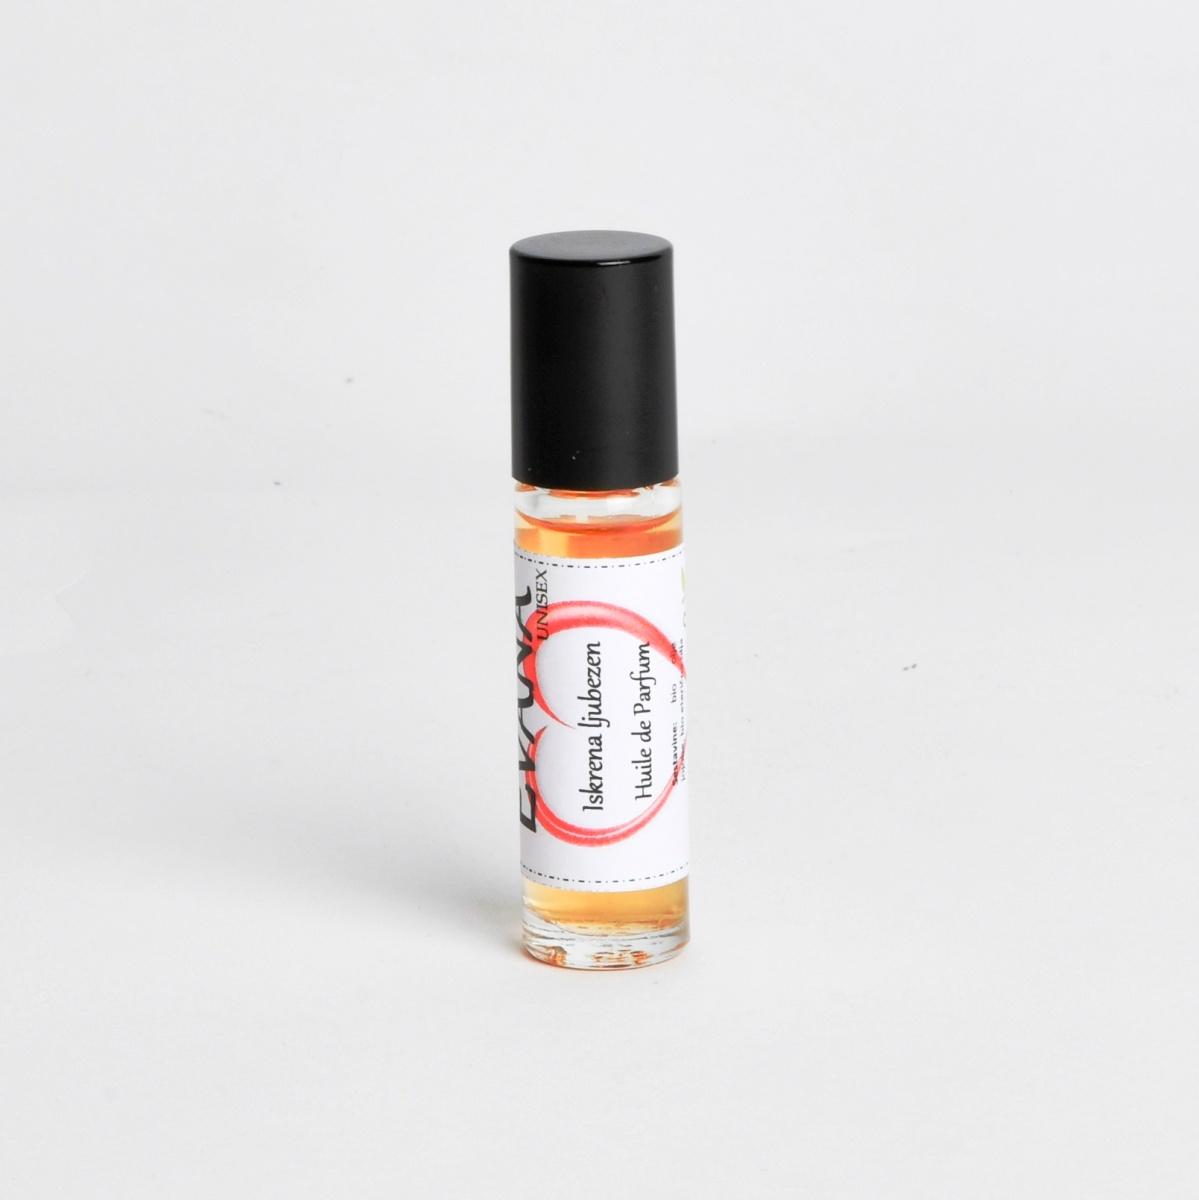 BIO huile de parfum 10 14 02 010